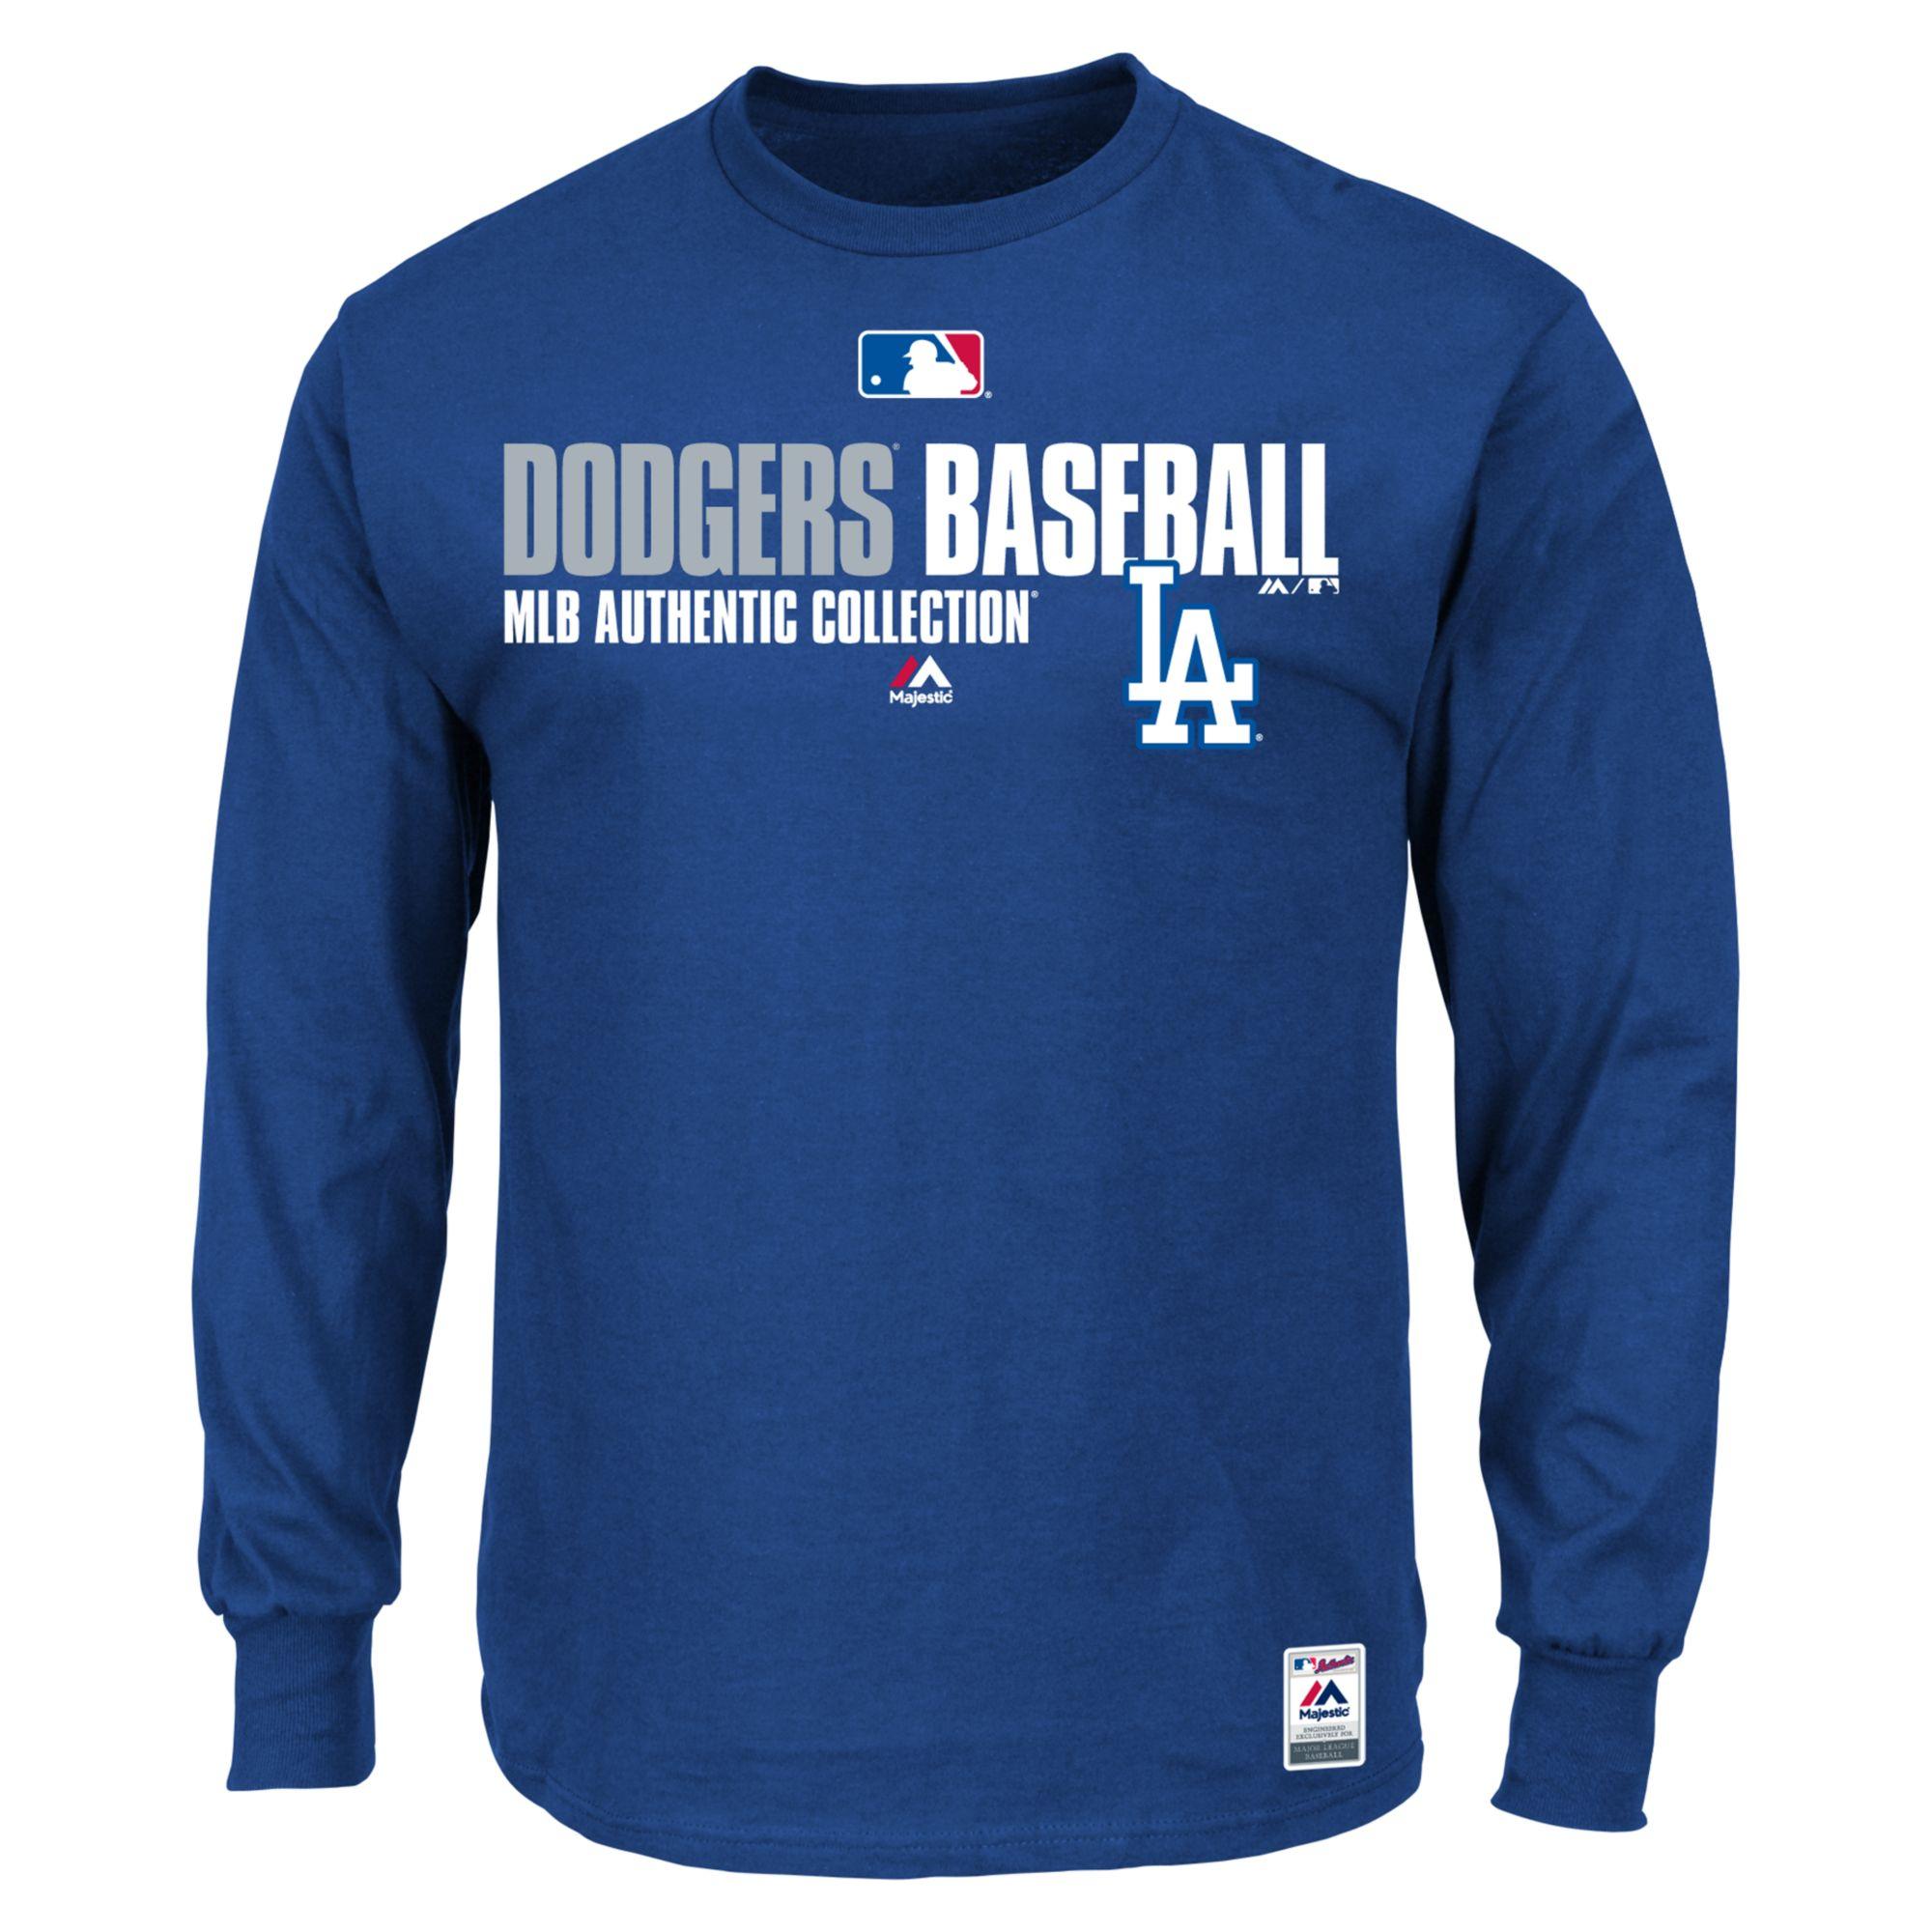 Majestic Mens Longsleeve Los Angeles Dodgers Tshirt In